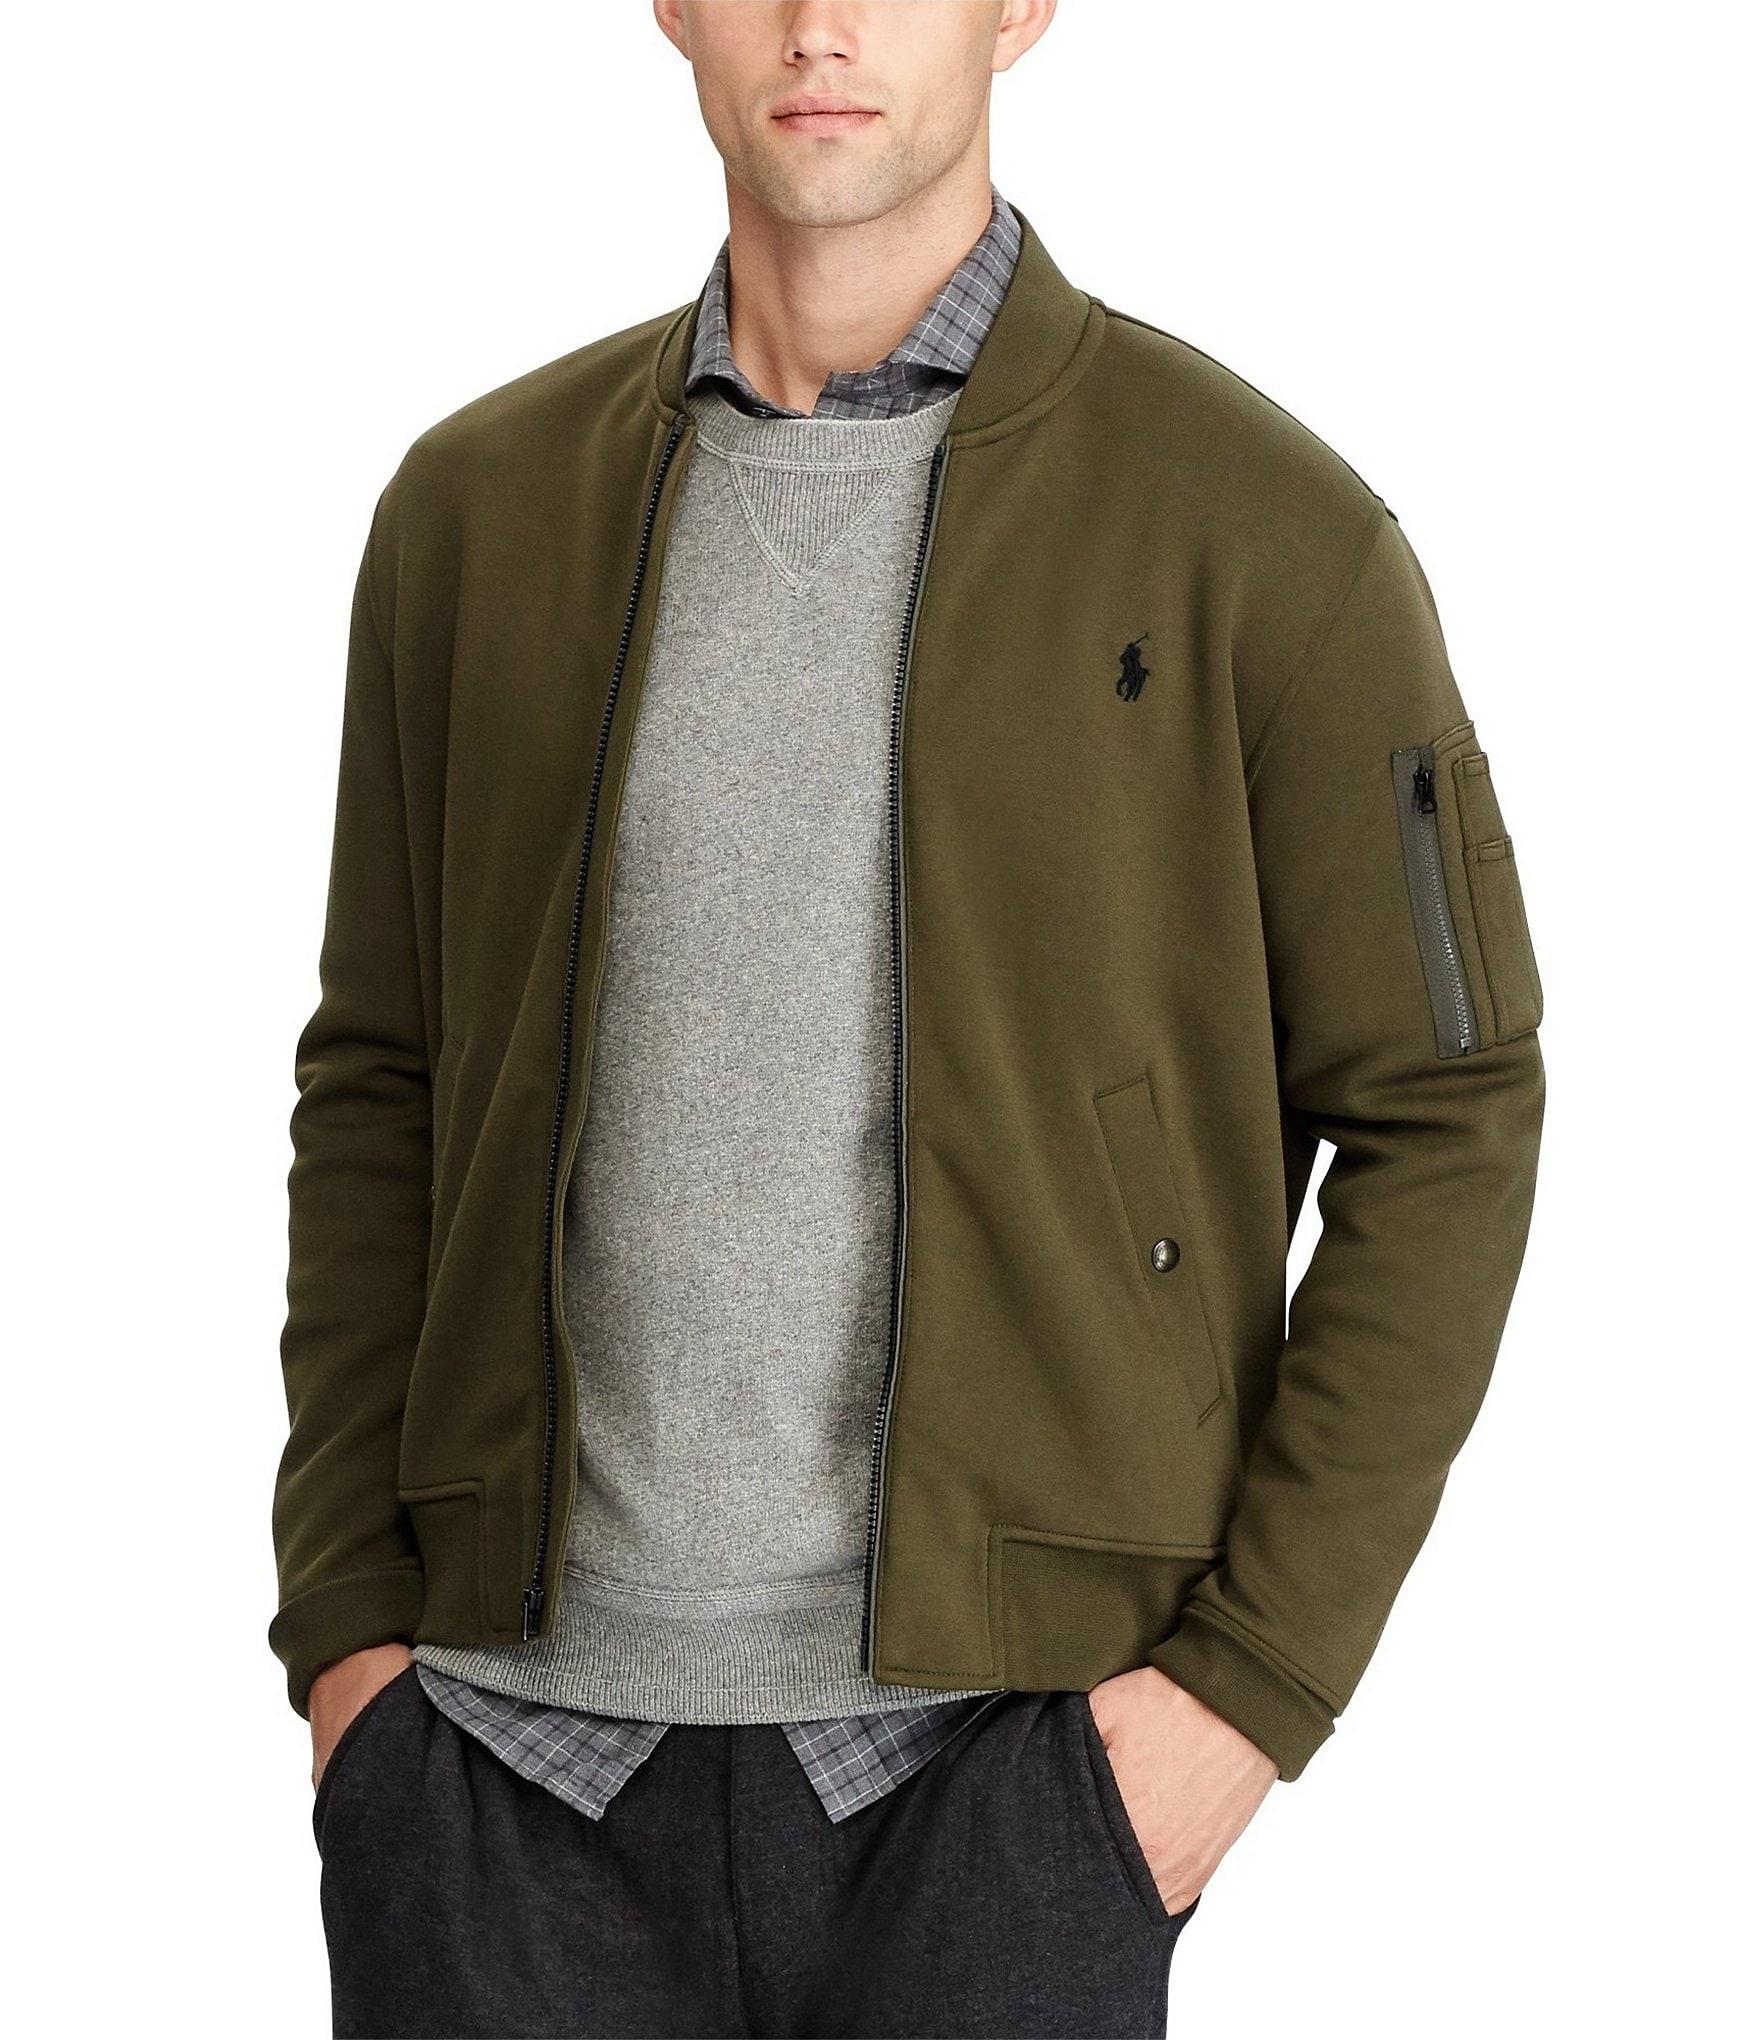 polo ralph lauren double knit full zip bomber jacket. Black Bedroom Furniture Sets. Home Design Ideas